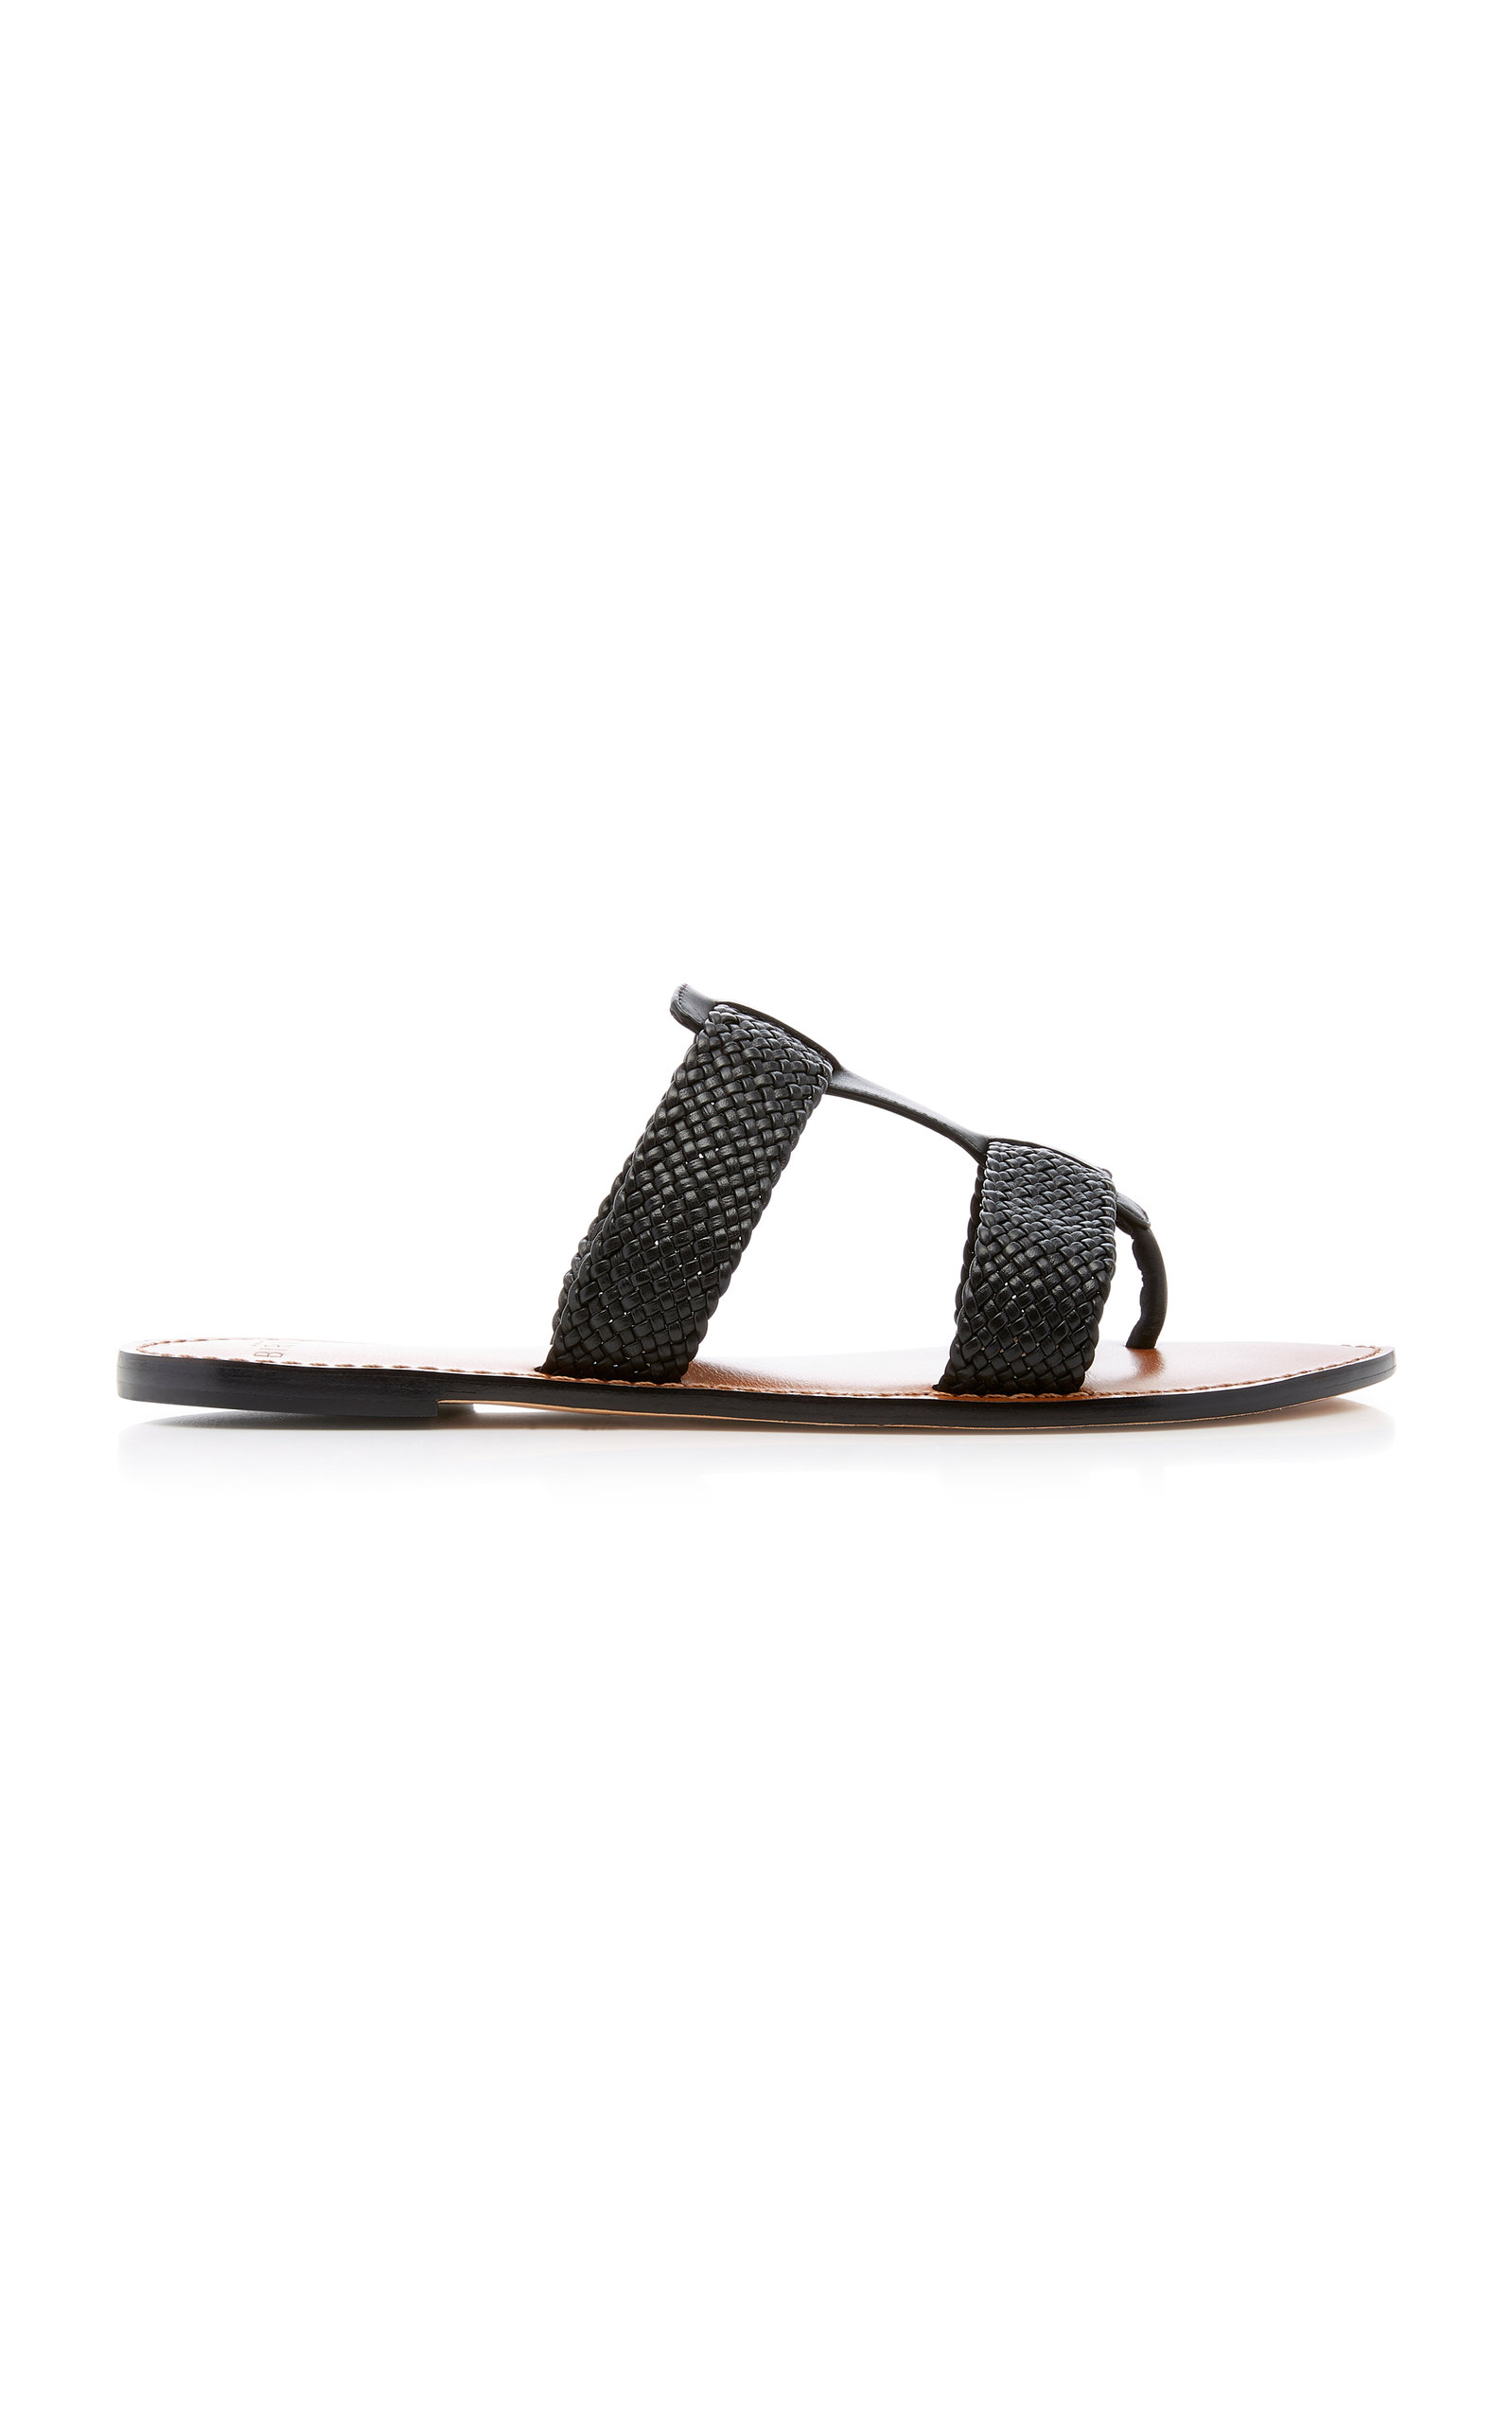 Woven Sandals By Moda Operandi Birman Alexandre Leather 0OrRZwq0